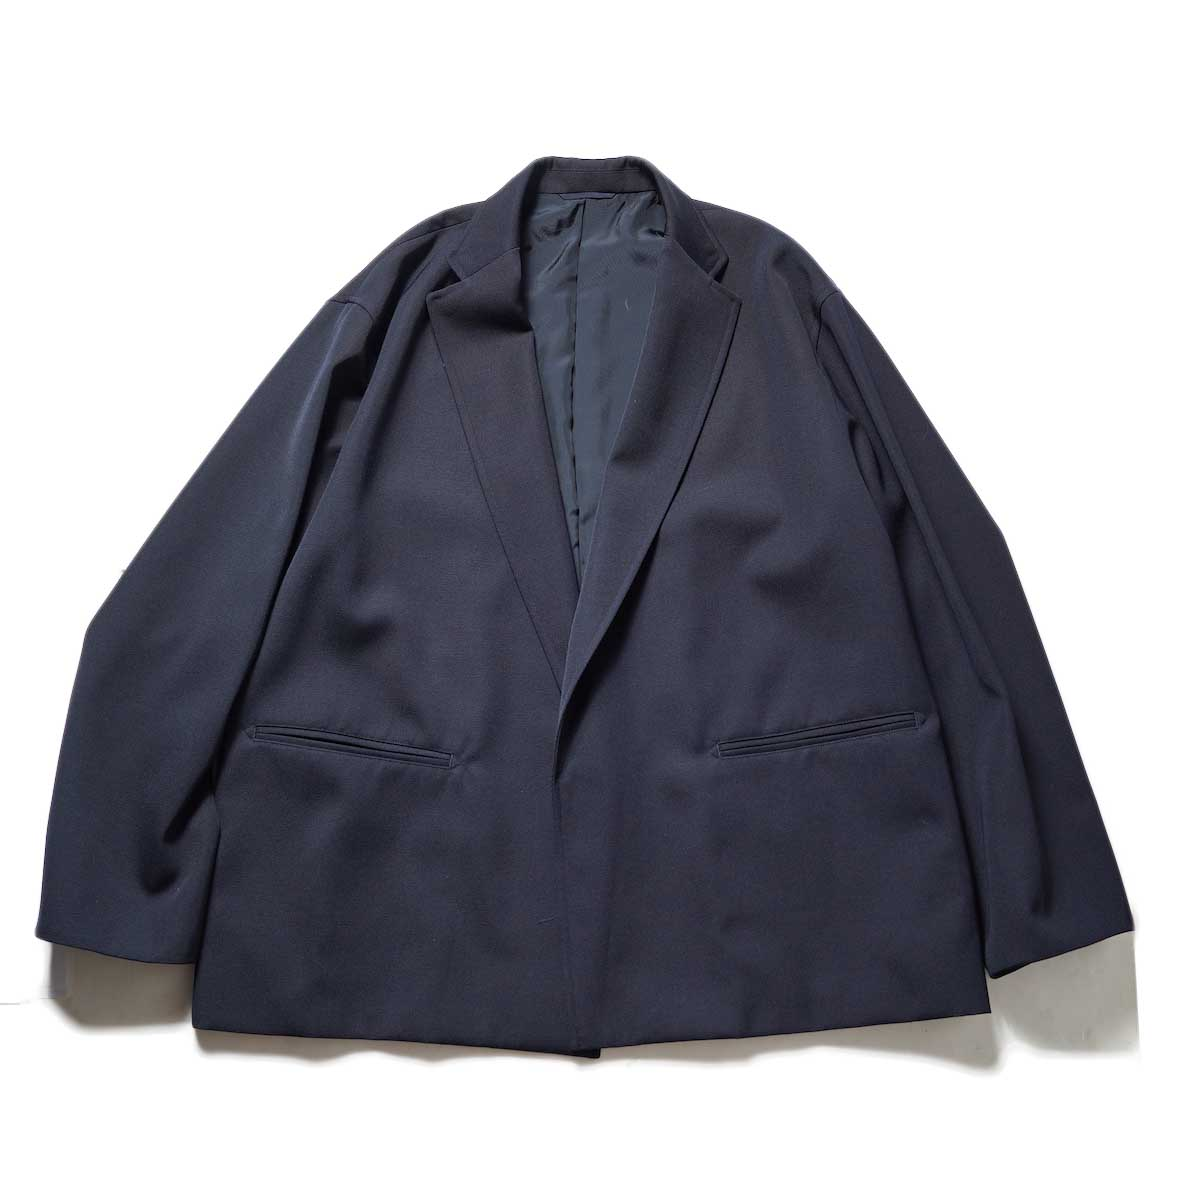 blurhms / Wool Surge Cardigan Jacket (Dark Navy)